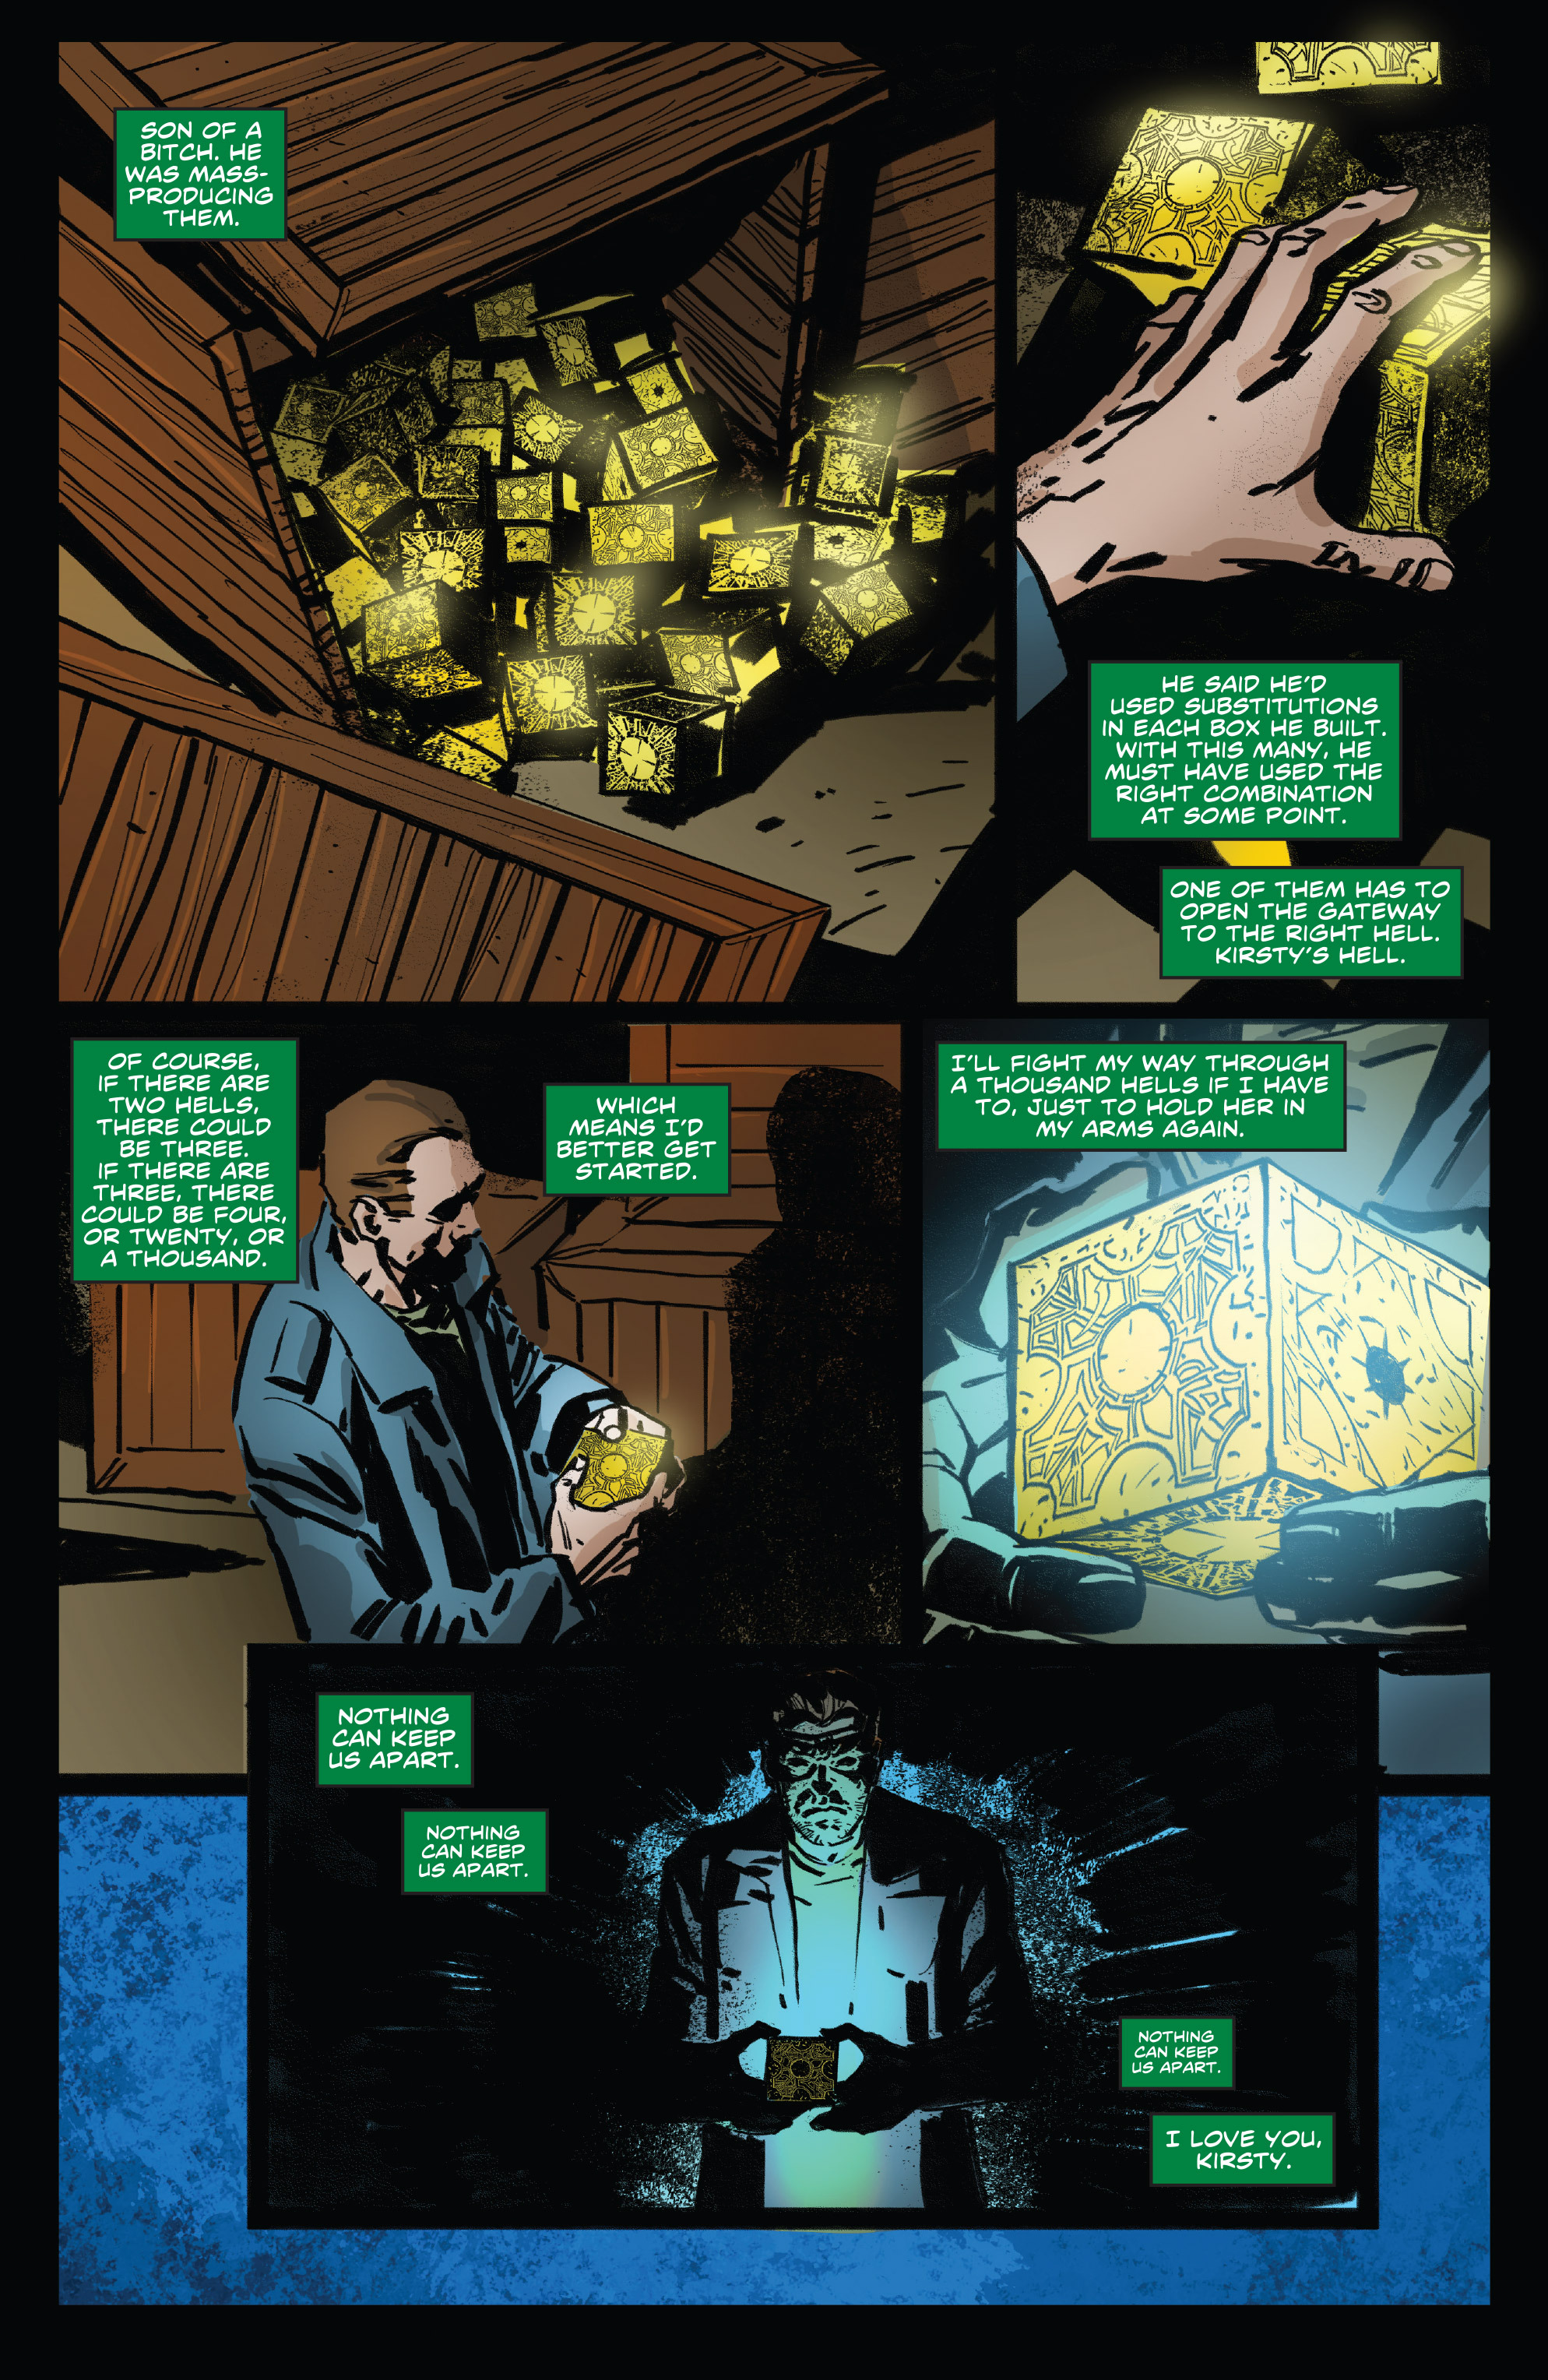 Read online Clive Barker's Hellraiser: The Dark Watch comic -  Issue # TPB 3 - 34